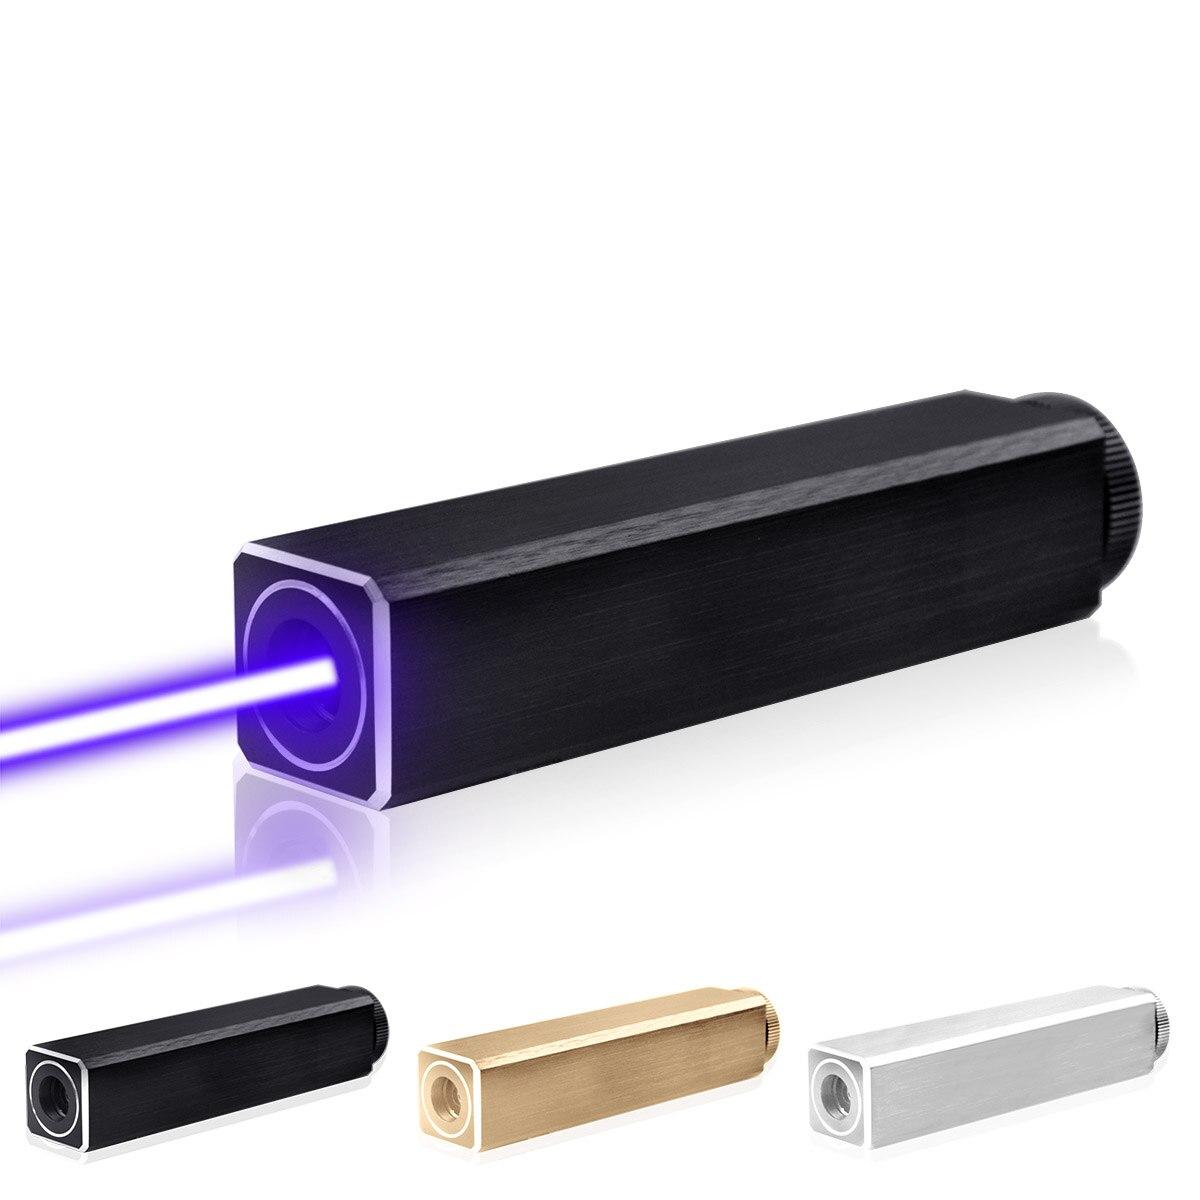 CWLASER 532nm vert/450nm bleu/405nm violet/650nm rouge pointeur Laser de forme carrée (3 couleurs) - 4